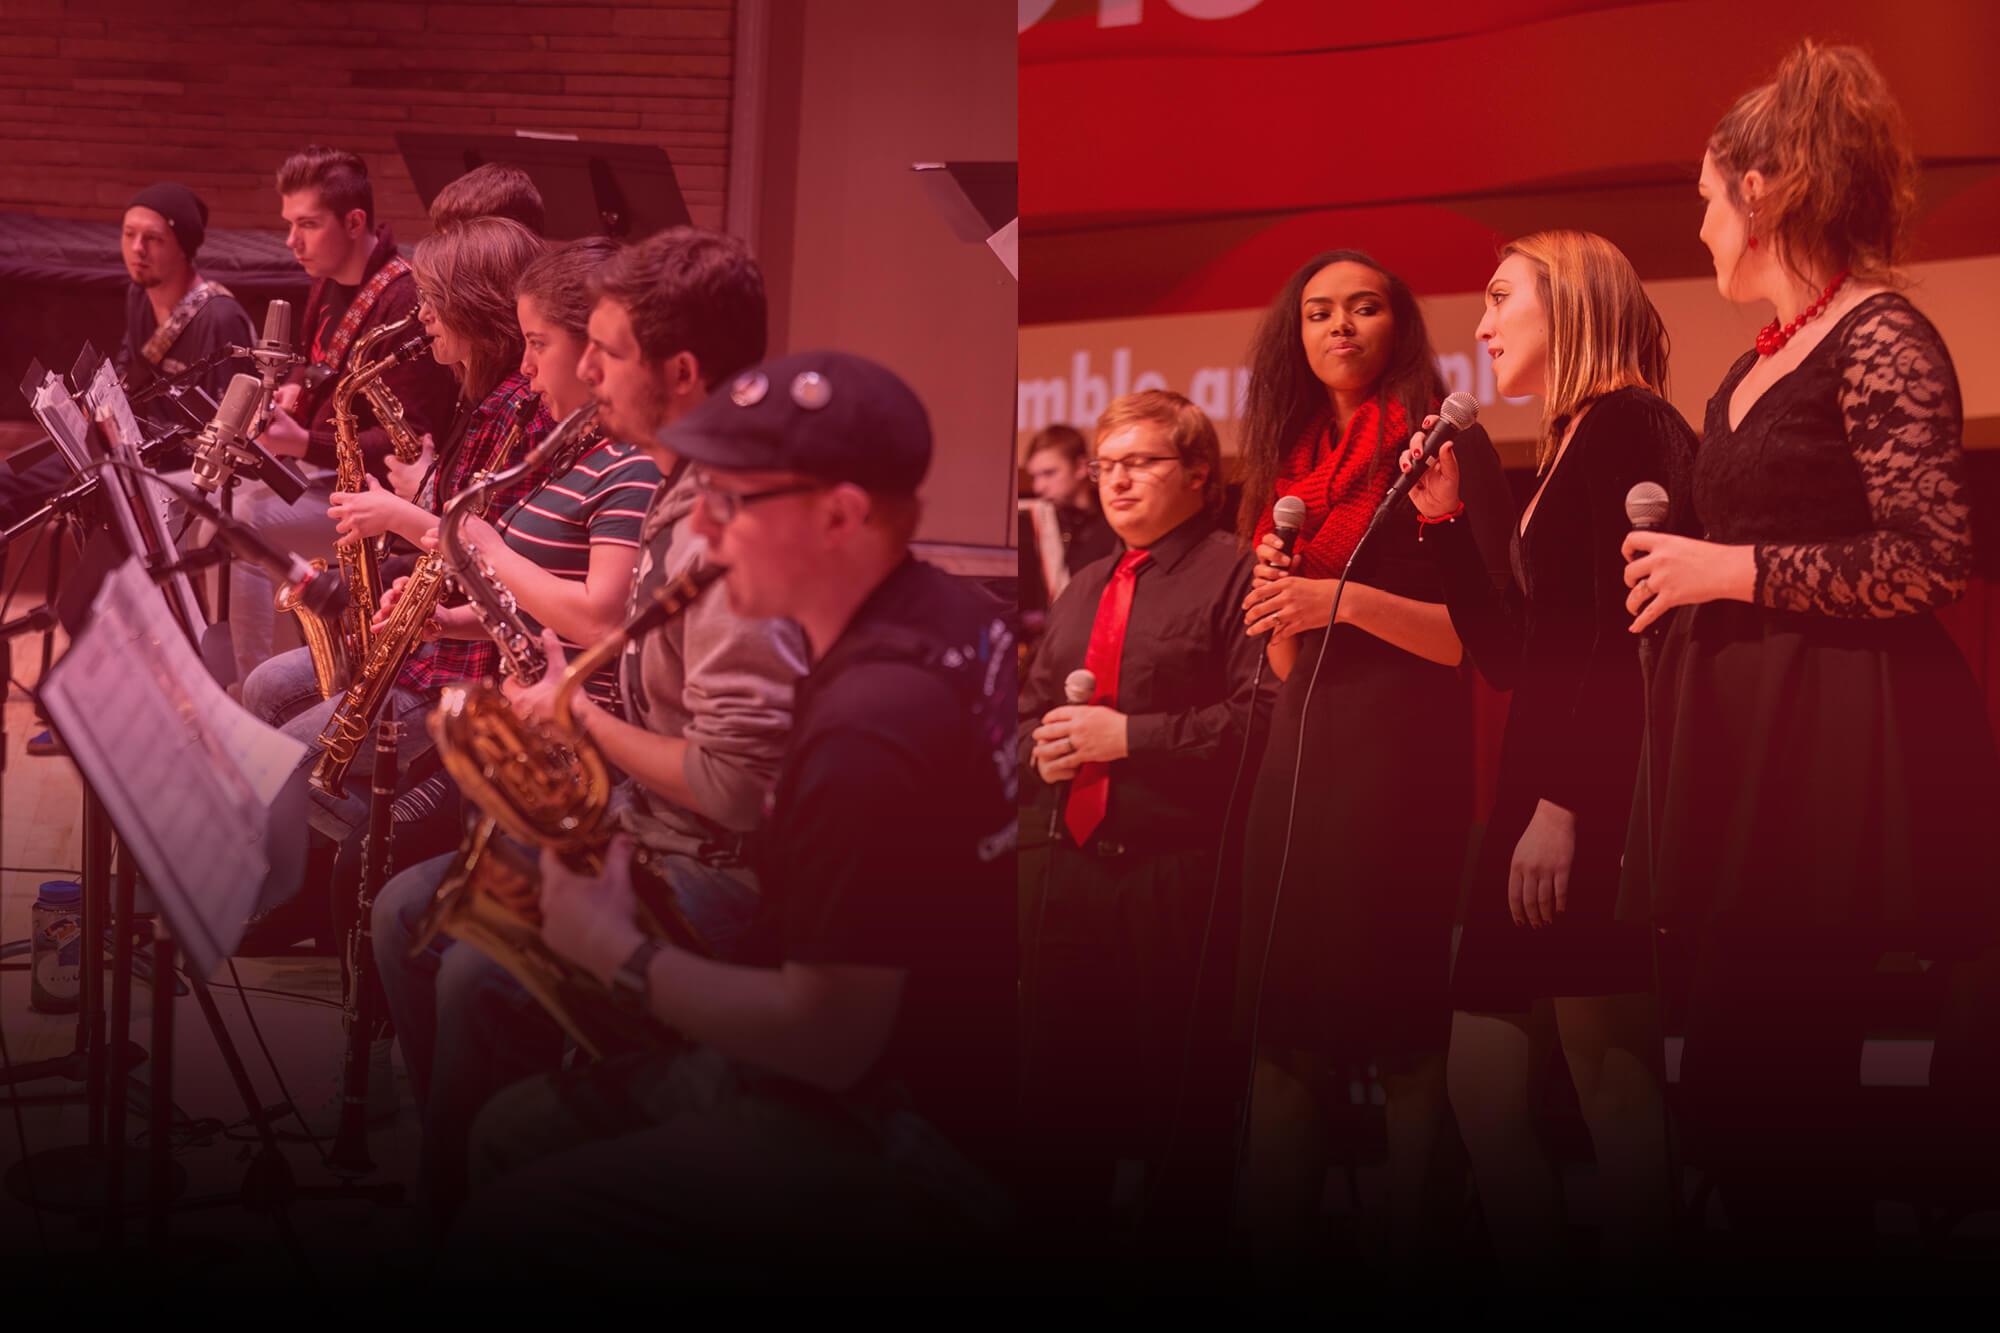 Photo of unidentified Casper College music students.